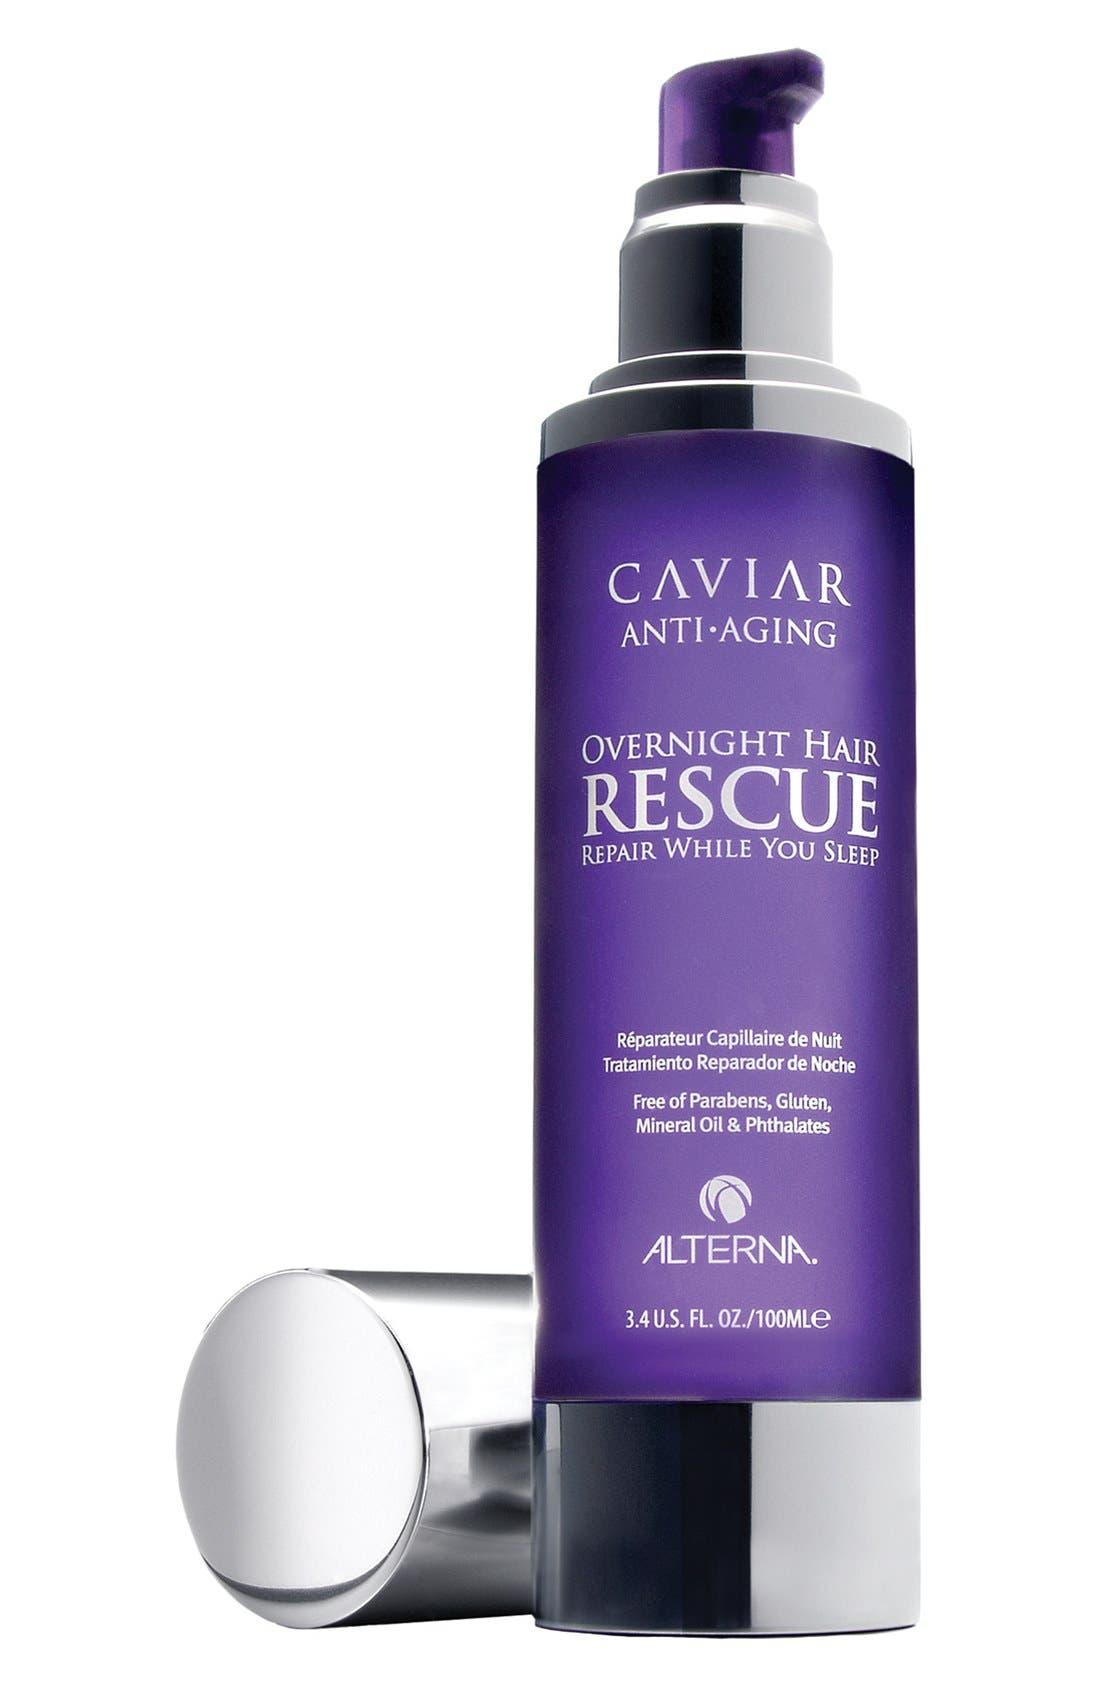 ALTERNA® Caviar Anti-Aging Overnight Hair Rescue Hair Treatment